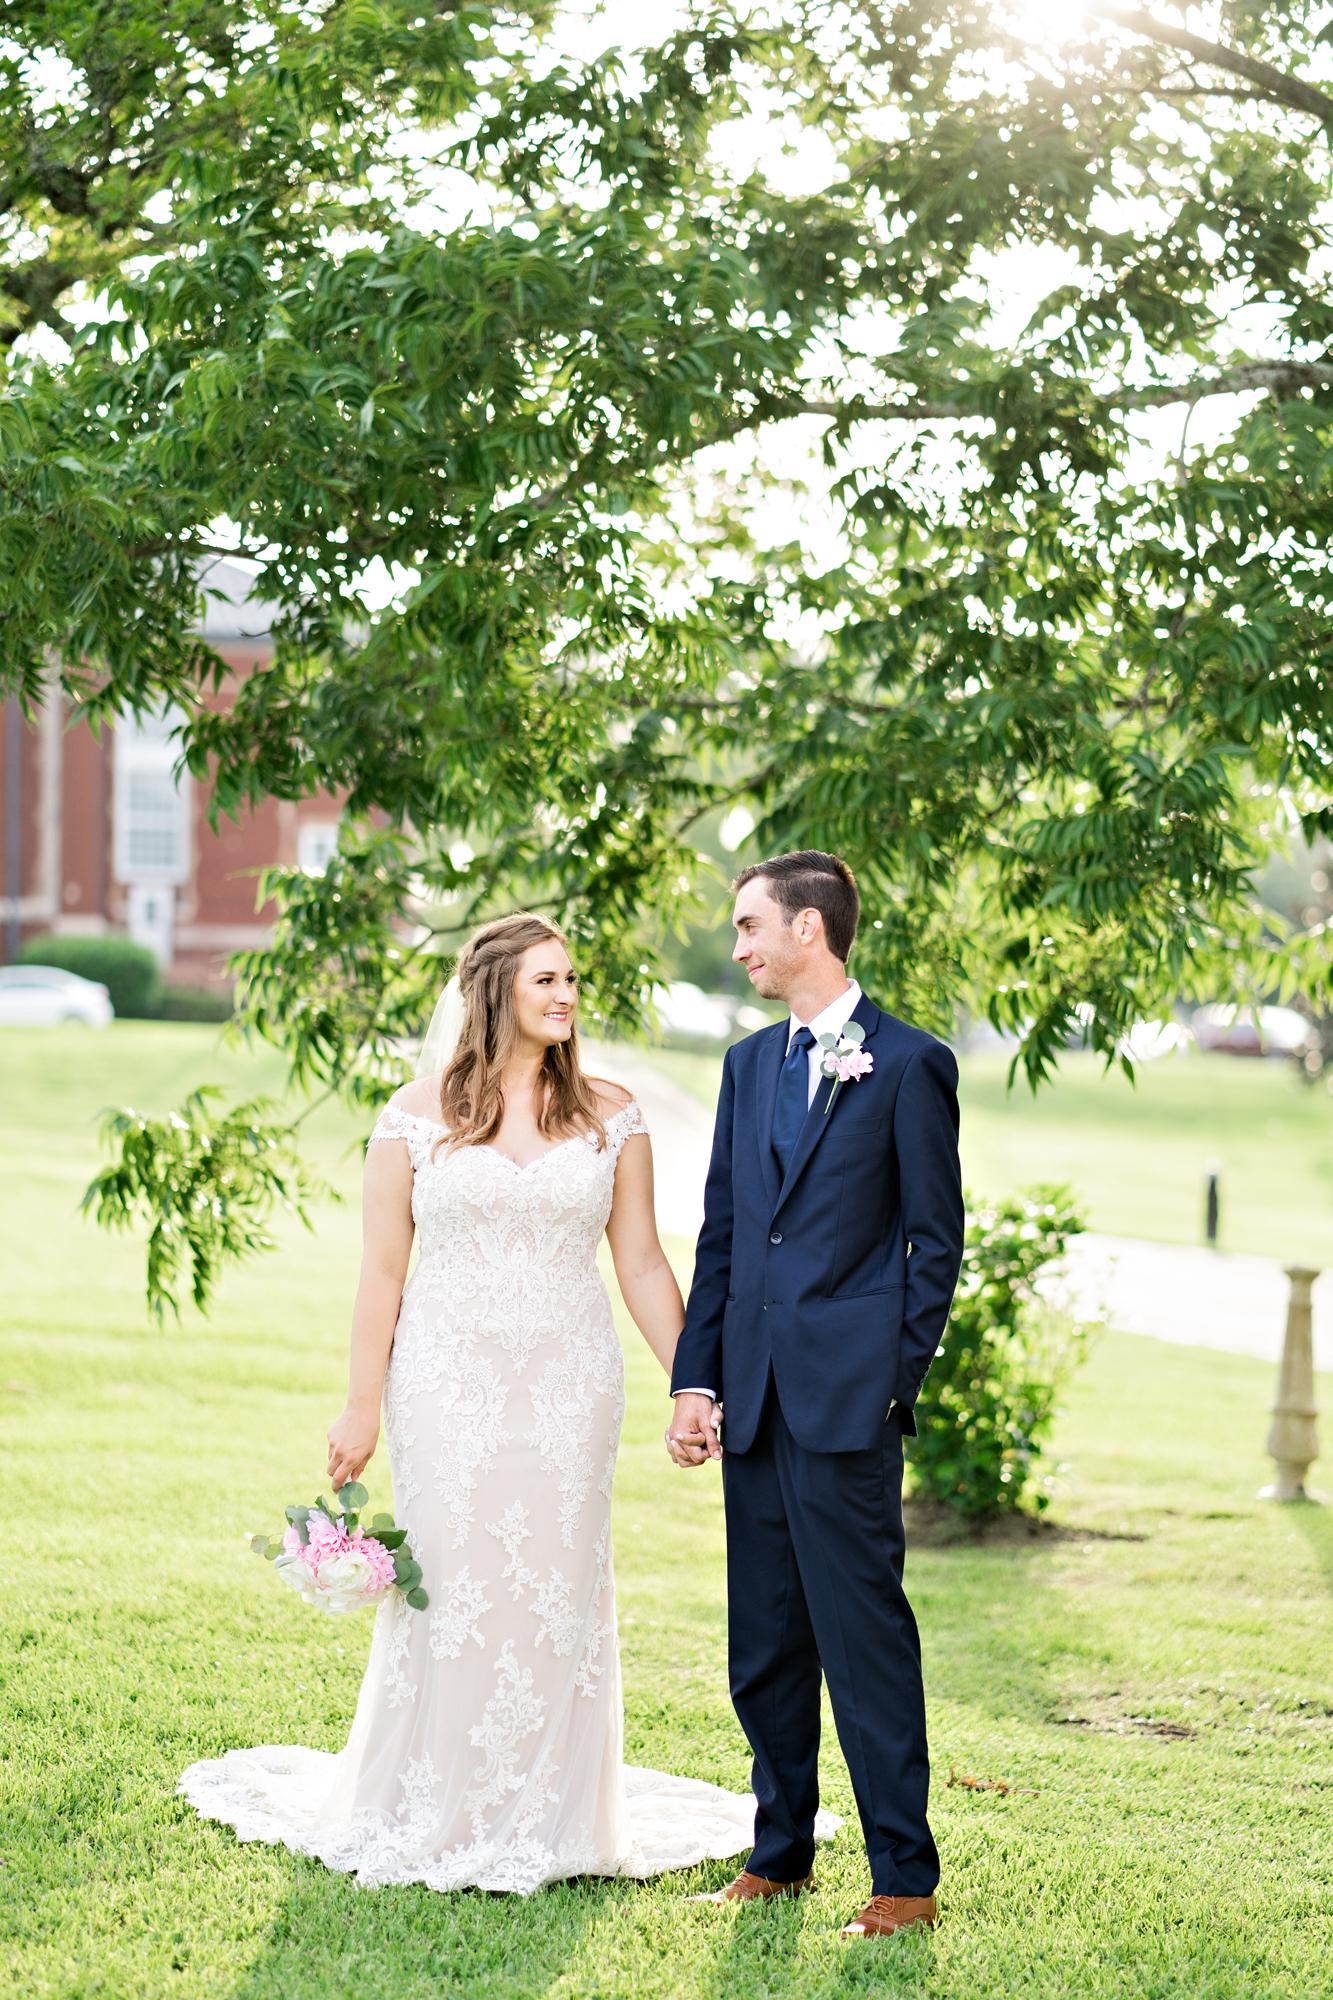 Alabama-Wedding-Photographer-Nick-Drollette-145.jpg